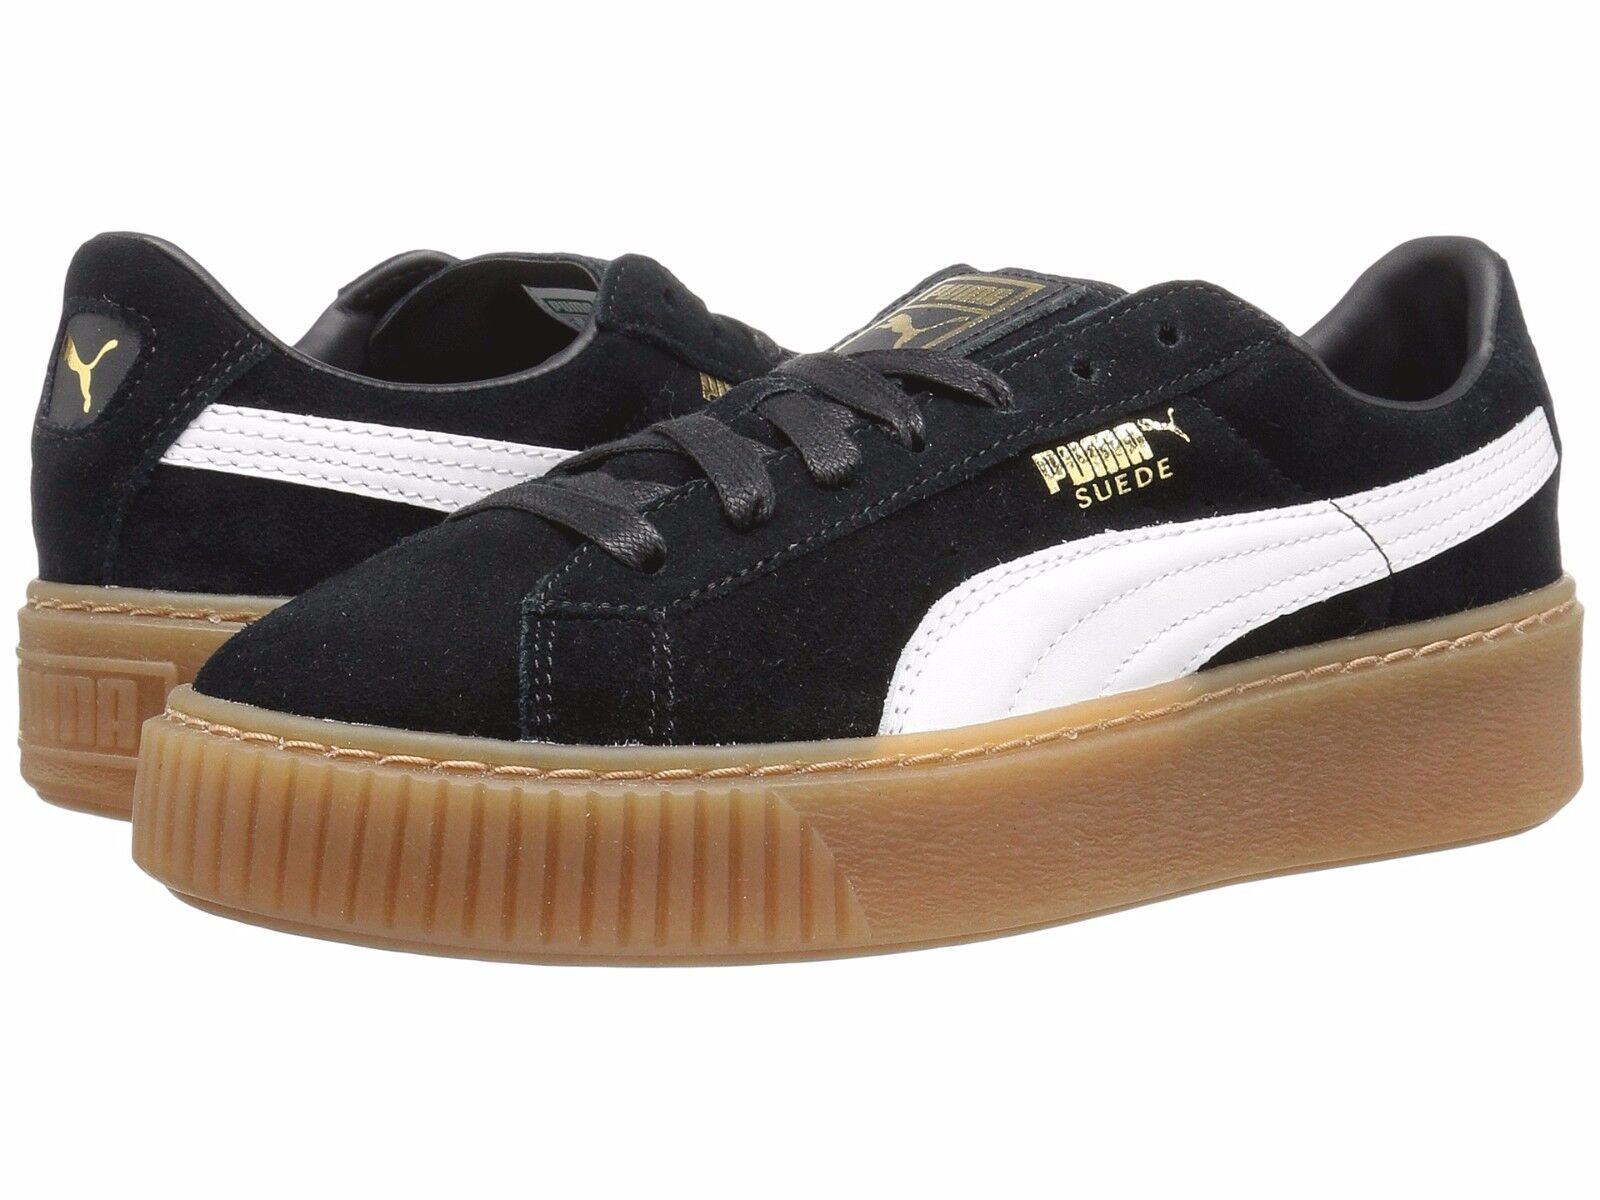 Women's shoes PUMA Suede Platform Core Sneakers 363559-02 Black   White New